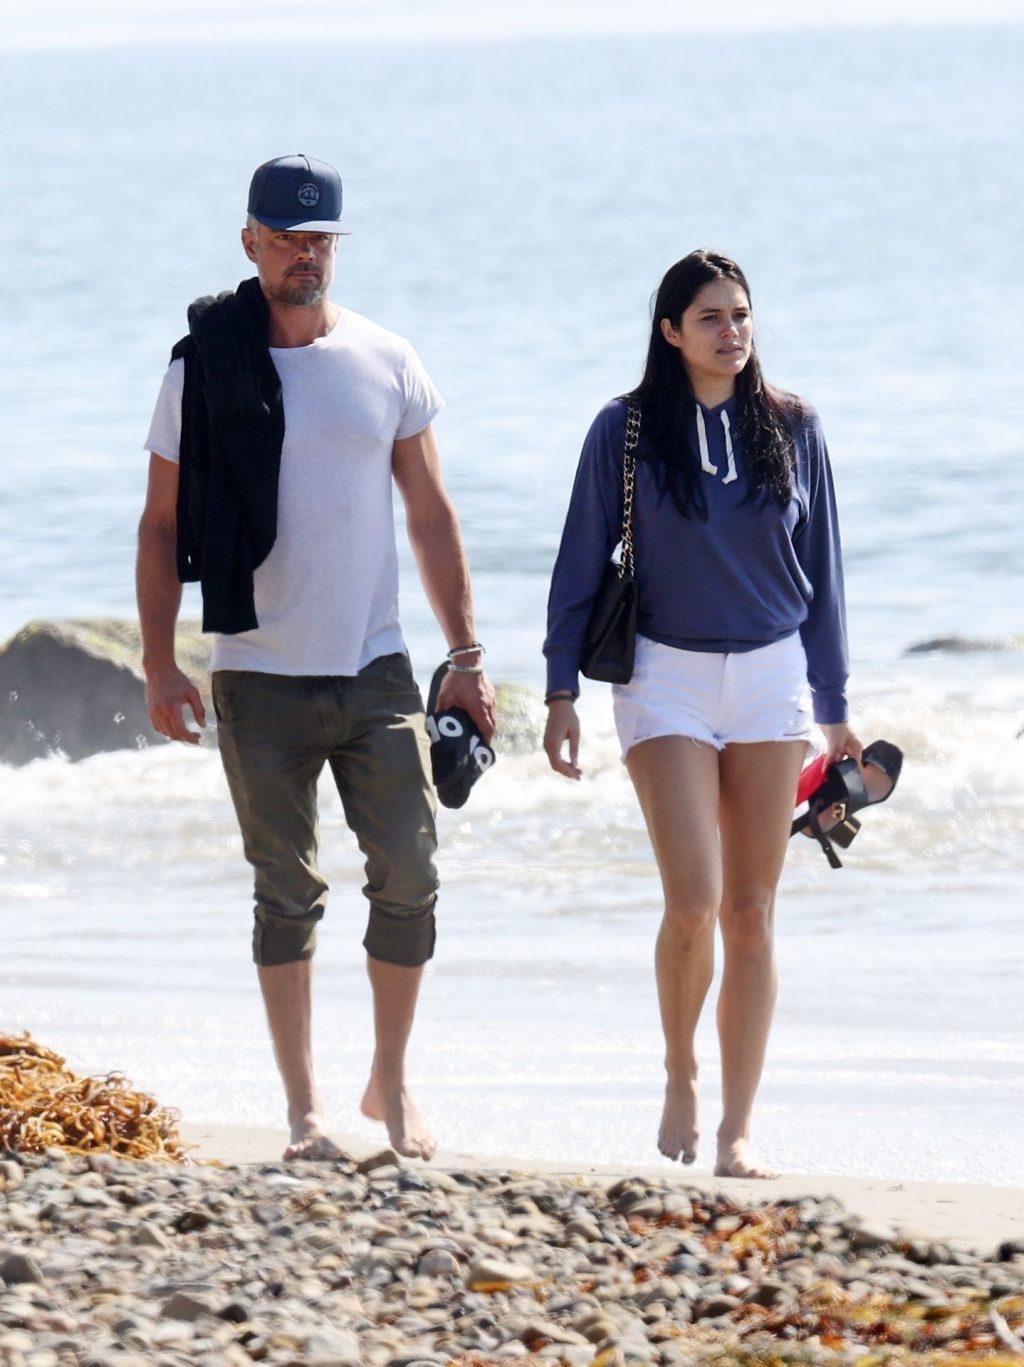 Josh Duhamel & Audra Mari Walk on the Beach (13 Sexy Photos)